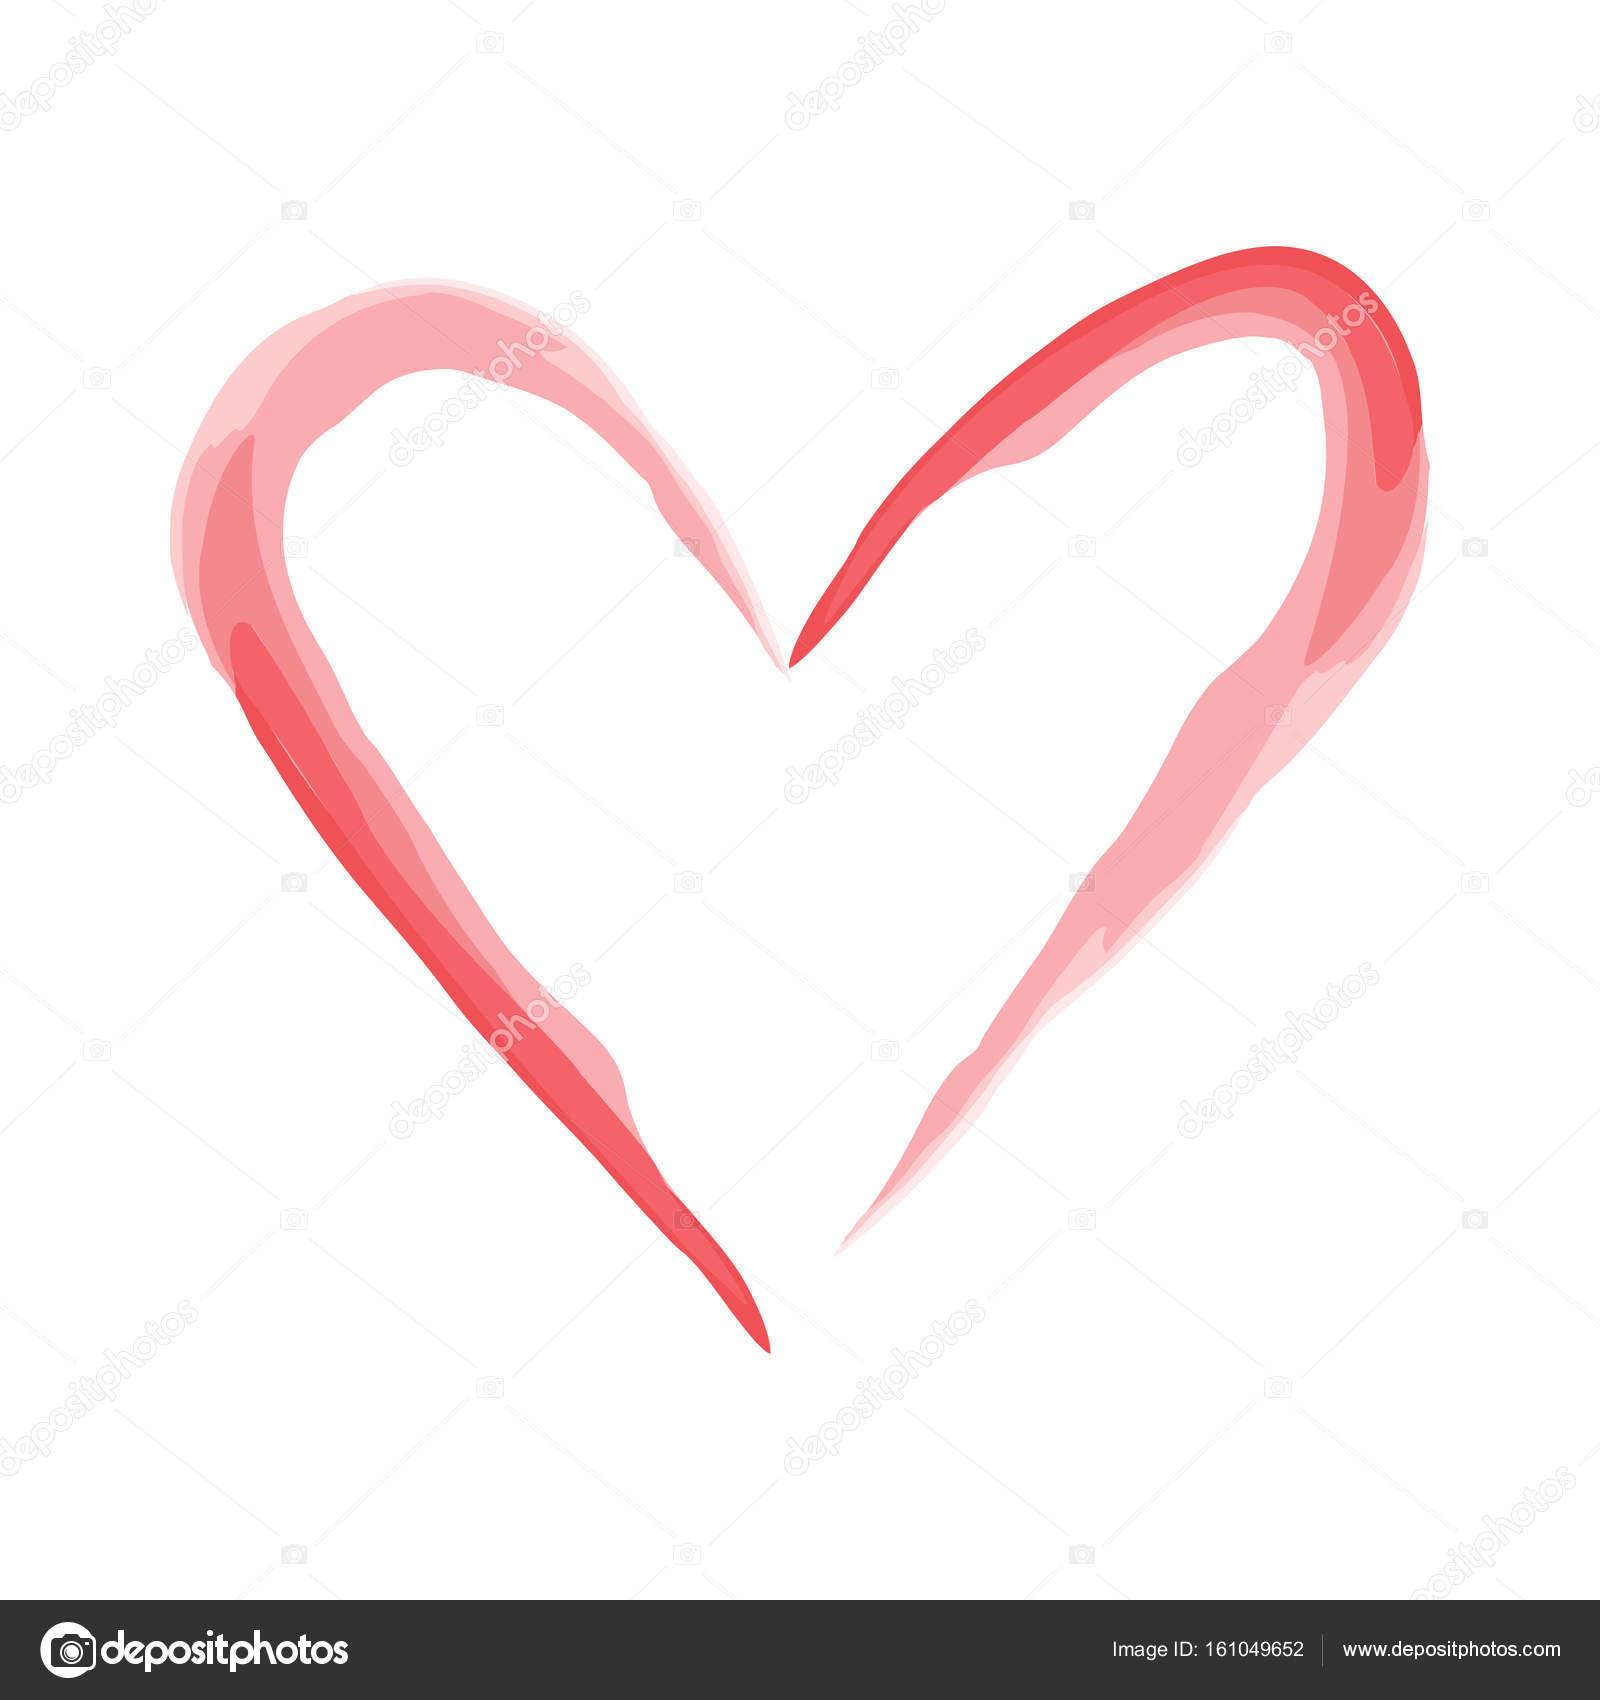 Heart Shape Design For Love Symbols Valentines Day Stock Vector